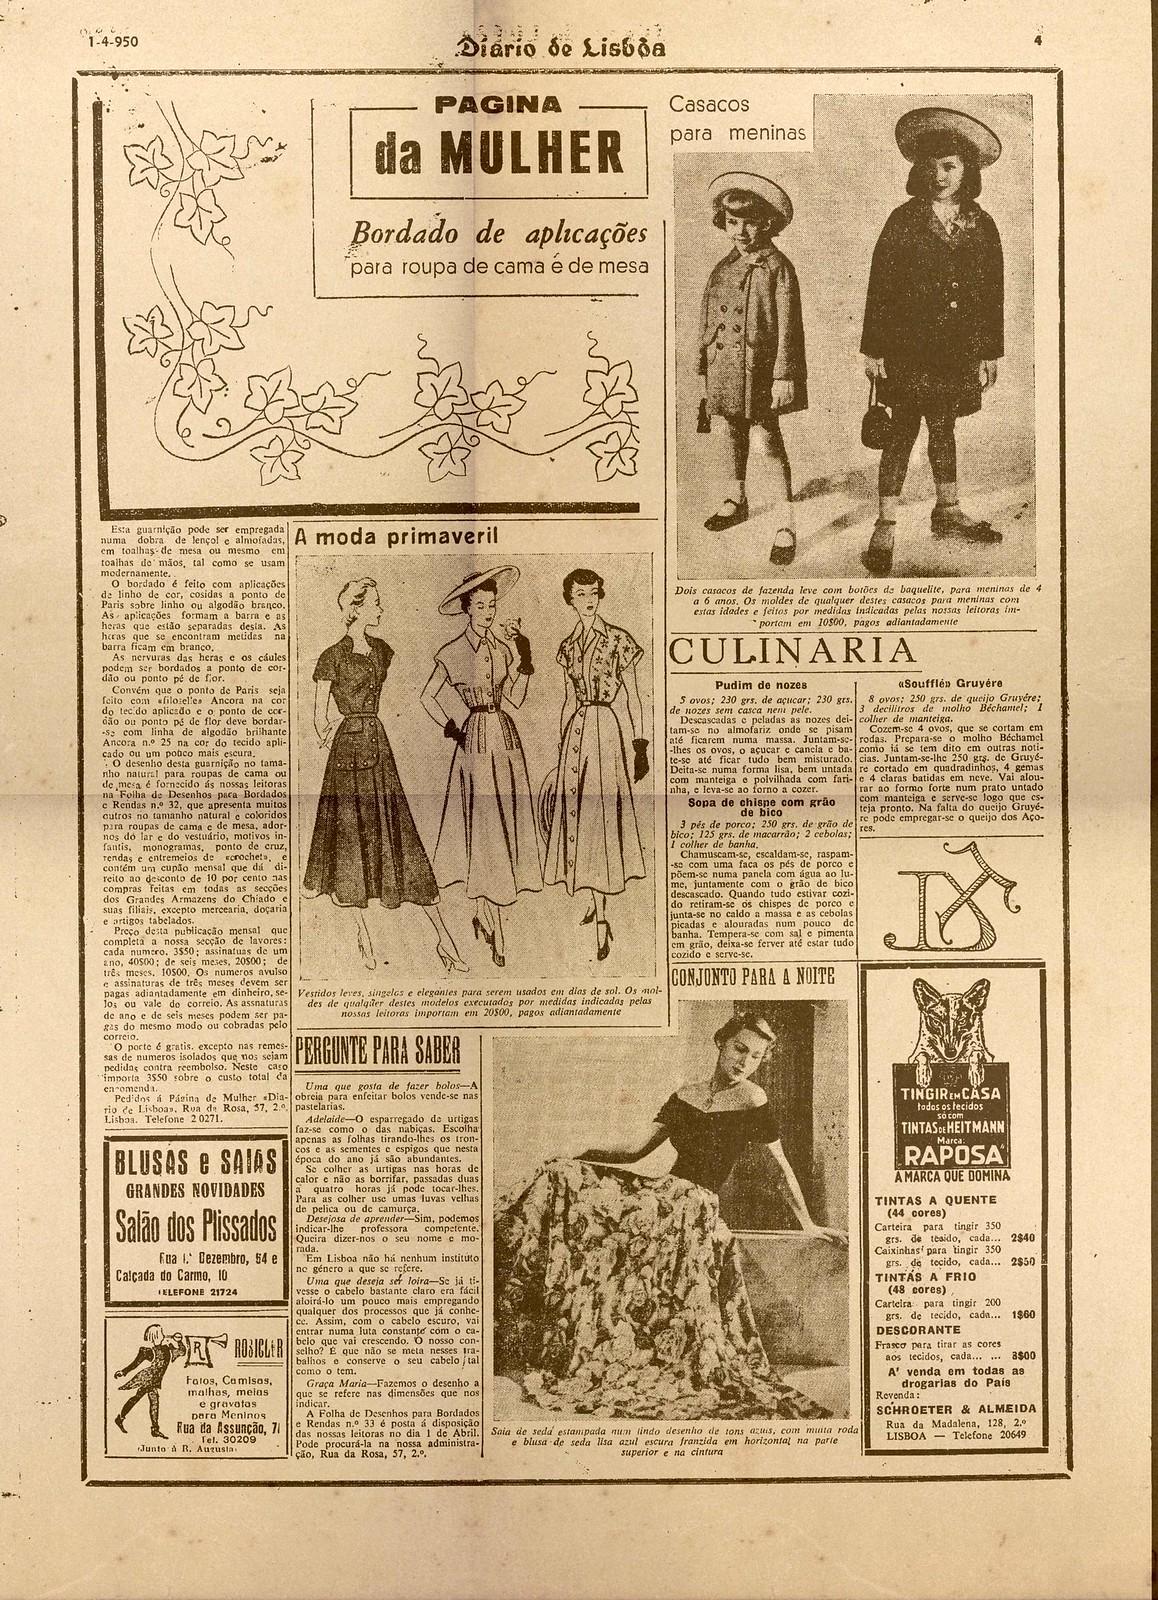 «Página da Mulher», in Diario de Lisbôa, 1/IV/950, p. 4.